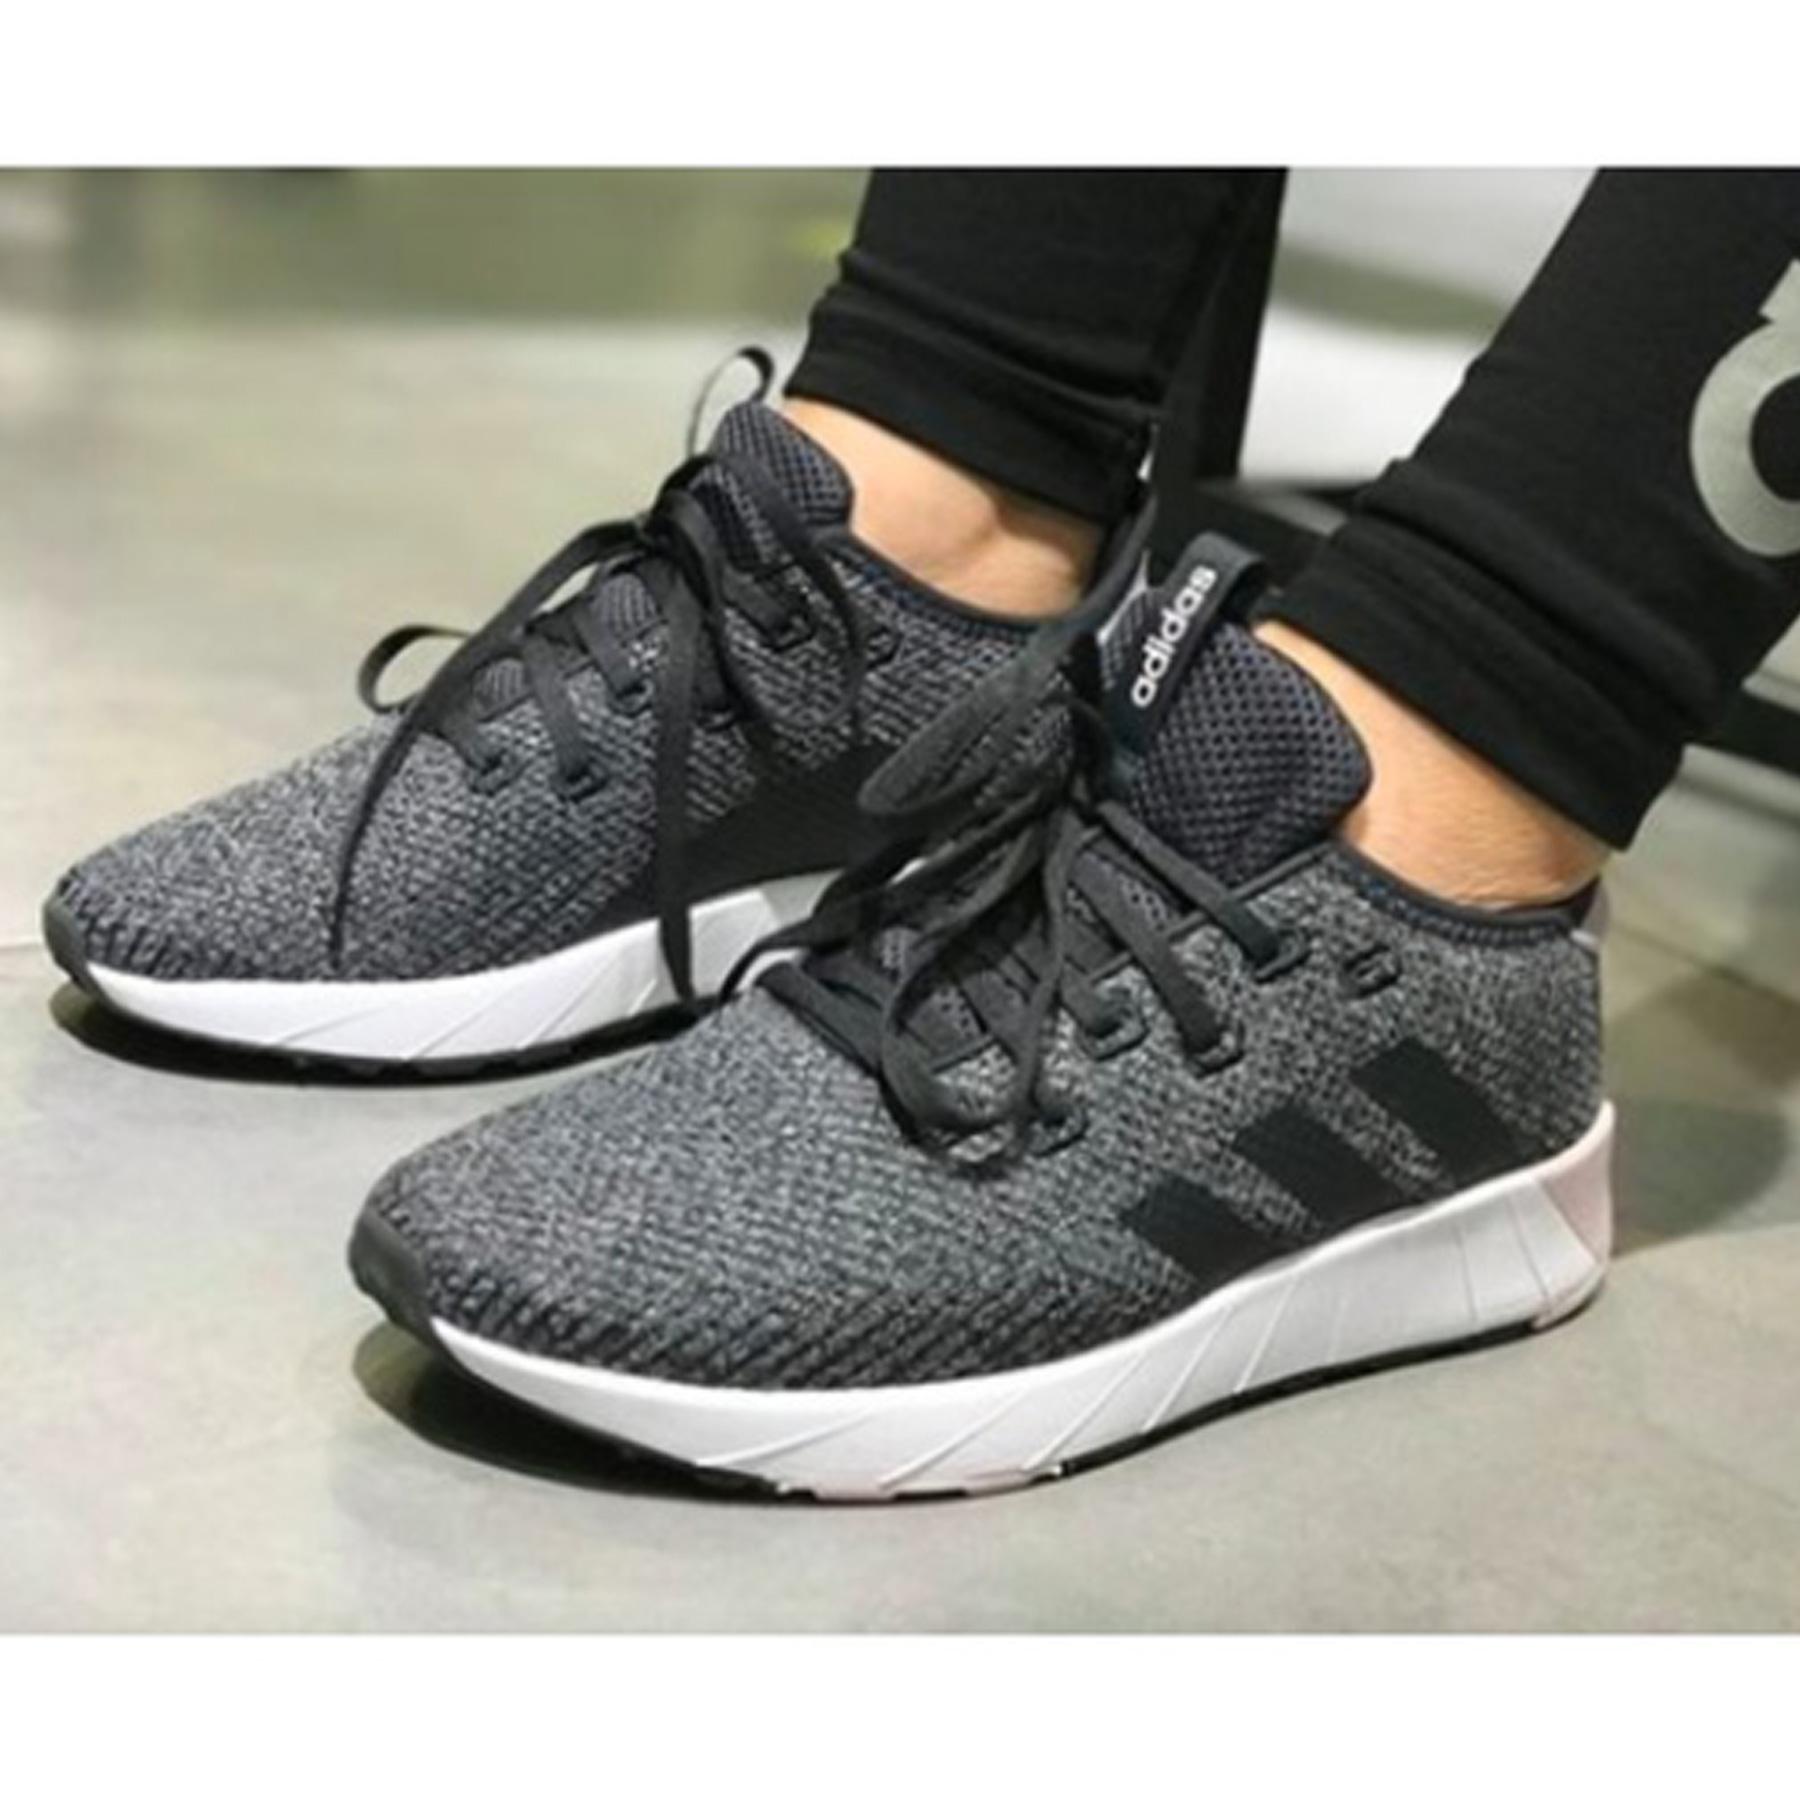 Adidas Originals Questar X BYD Women's